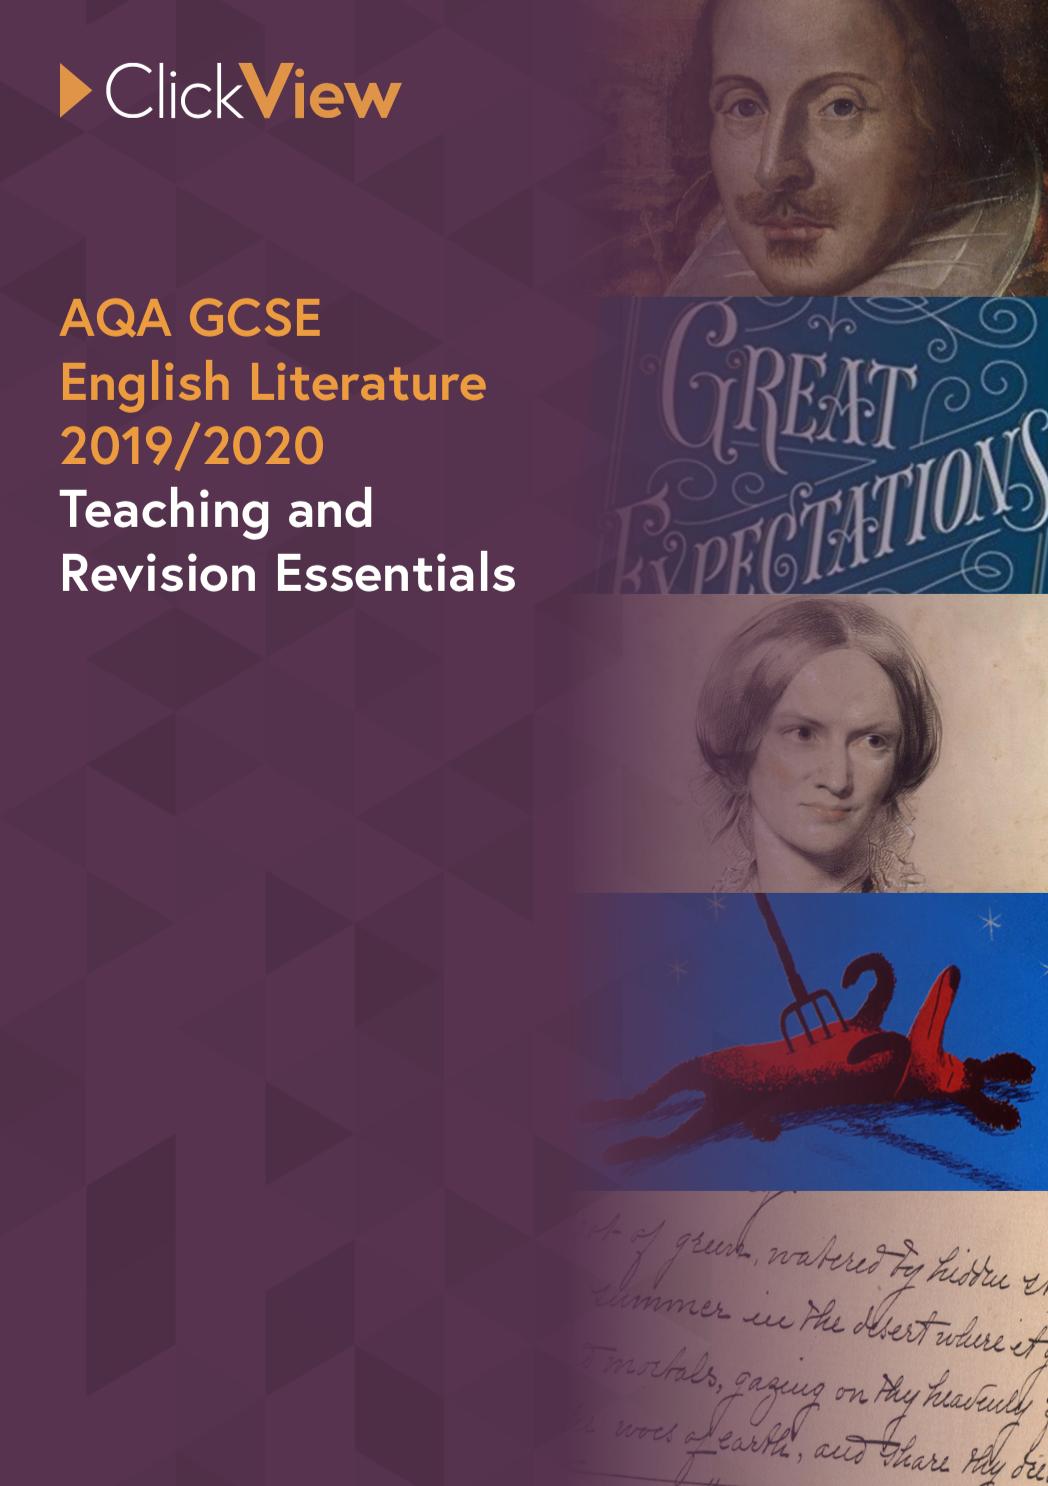 AQA GCSE English Literature - Teaching and Revision Essentials